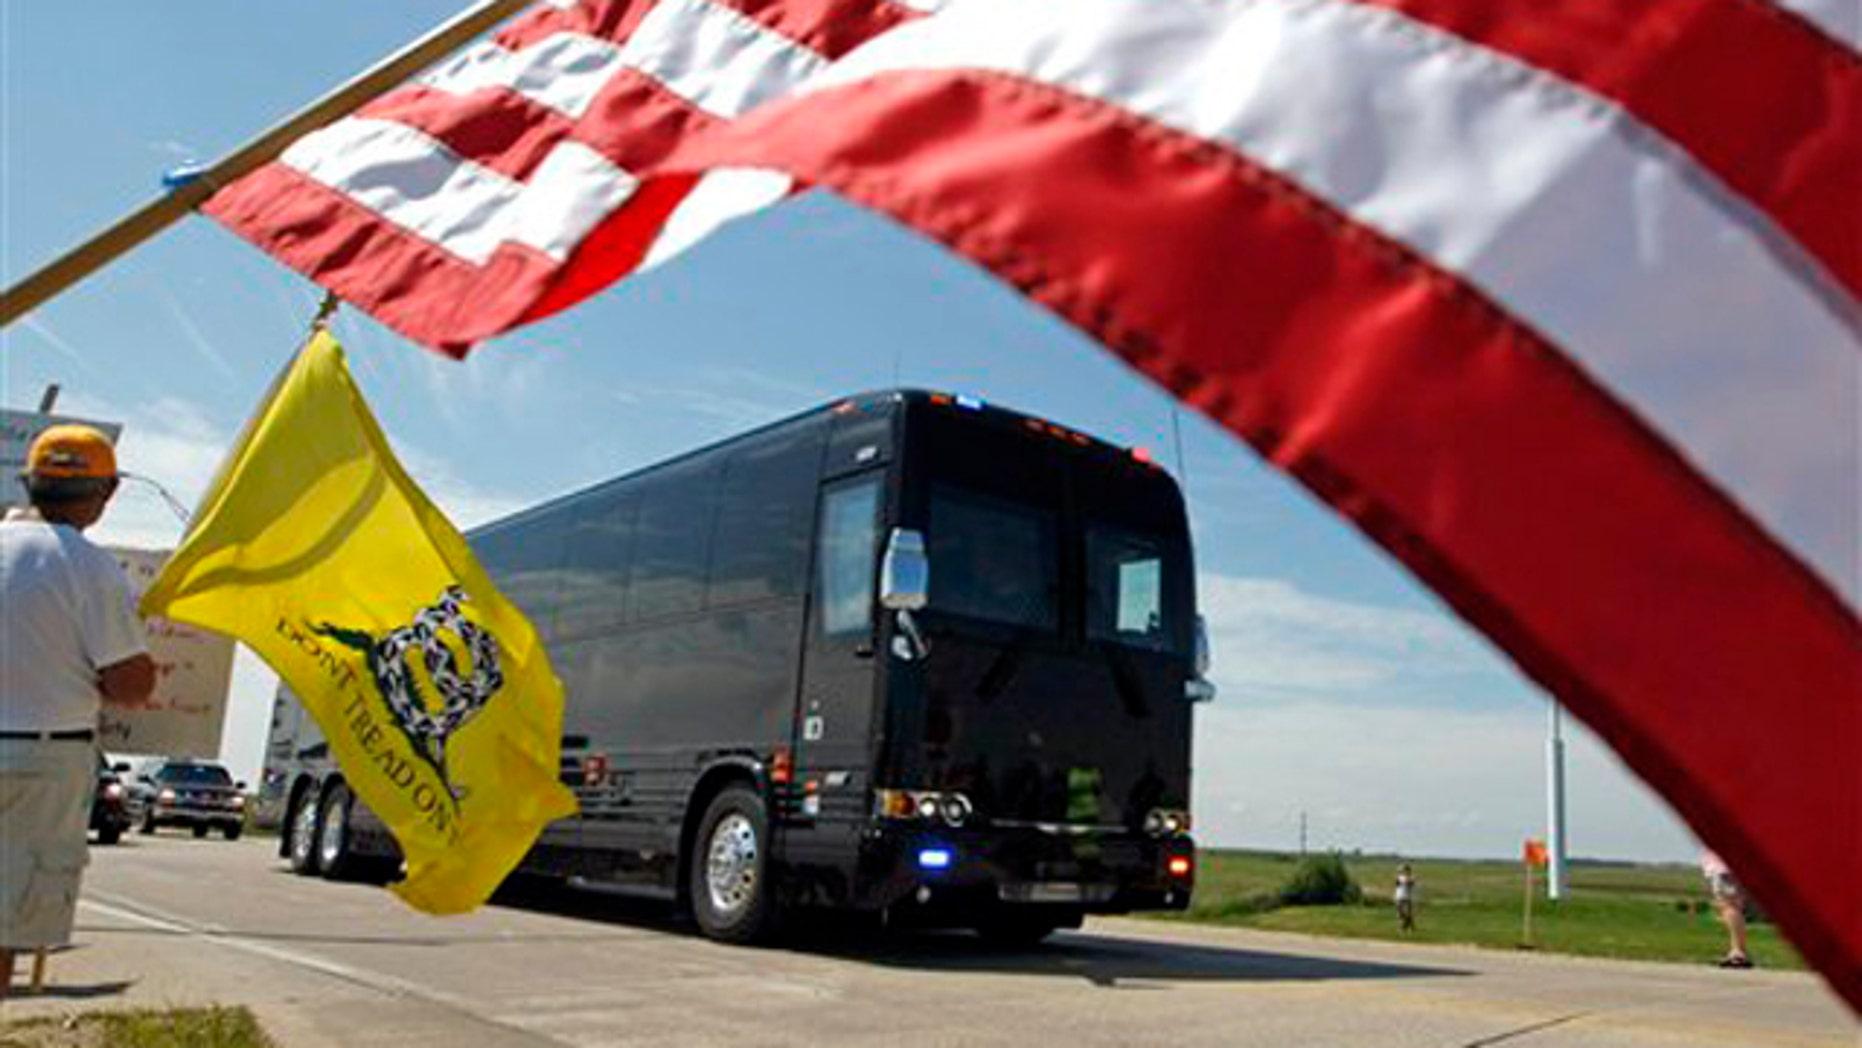 Aug. 16: President Obama's motorcade makes its way through Peosta, Iowa, en route to the Rural Economic Forum at the Northeast Iowa Community College.